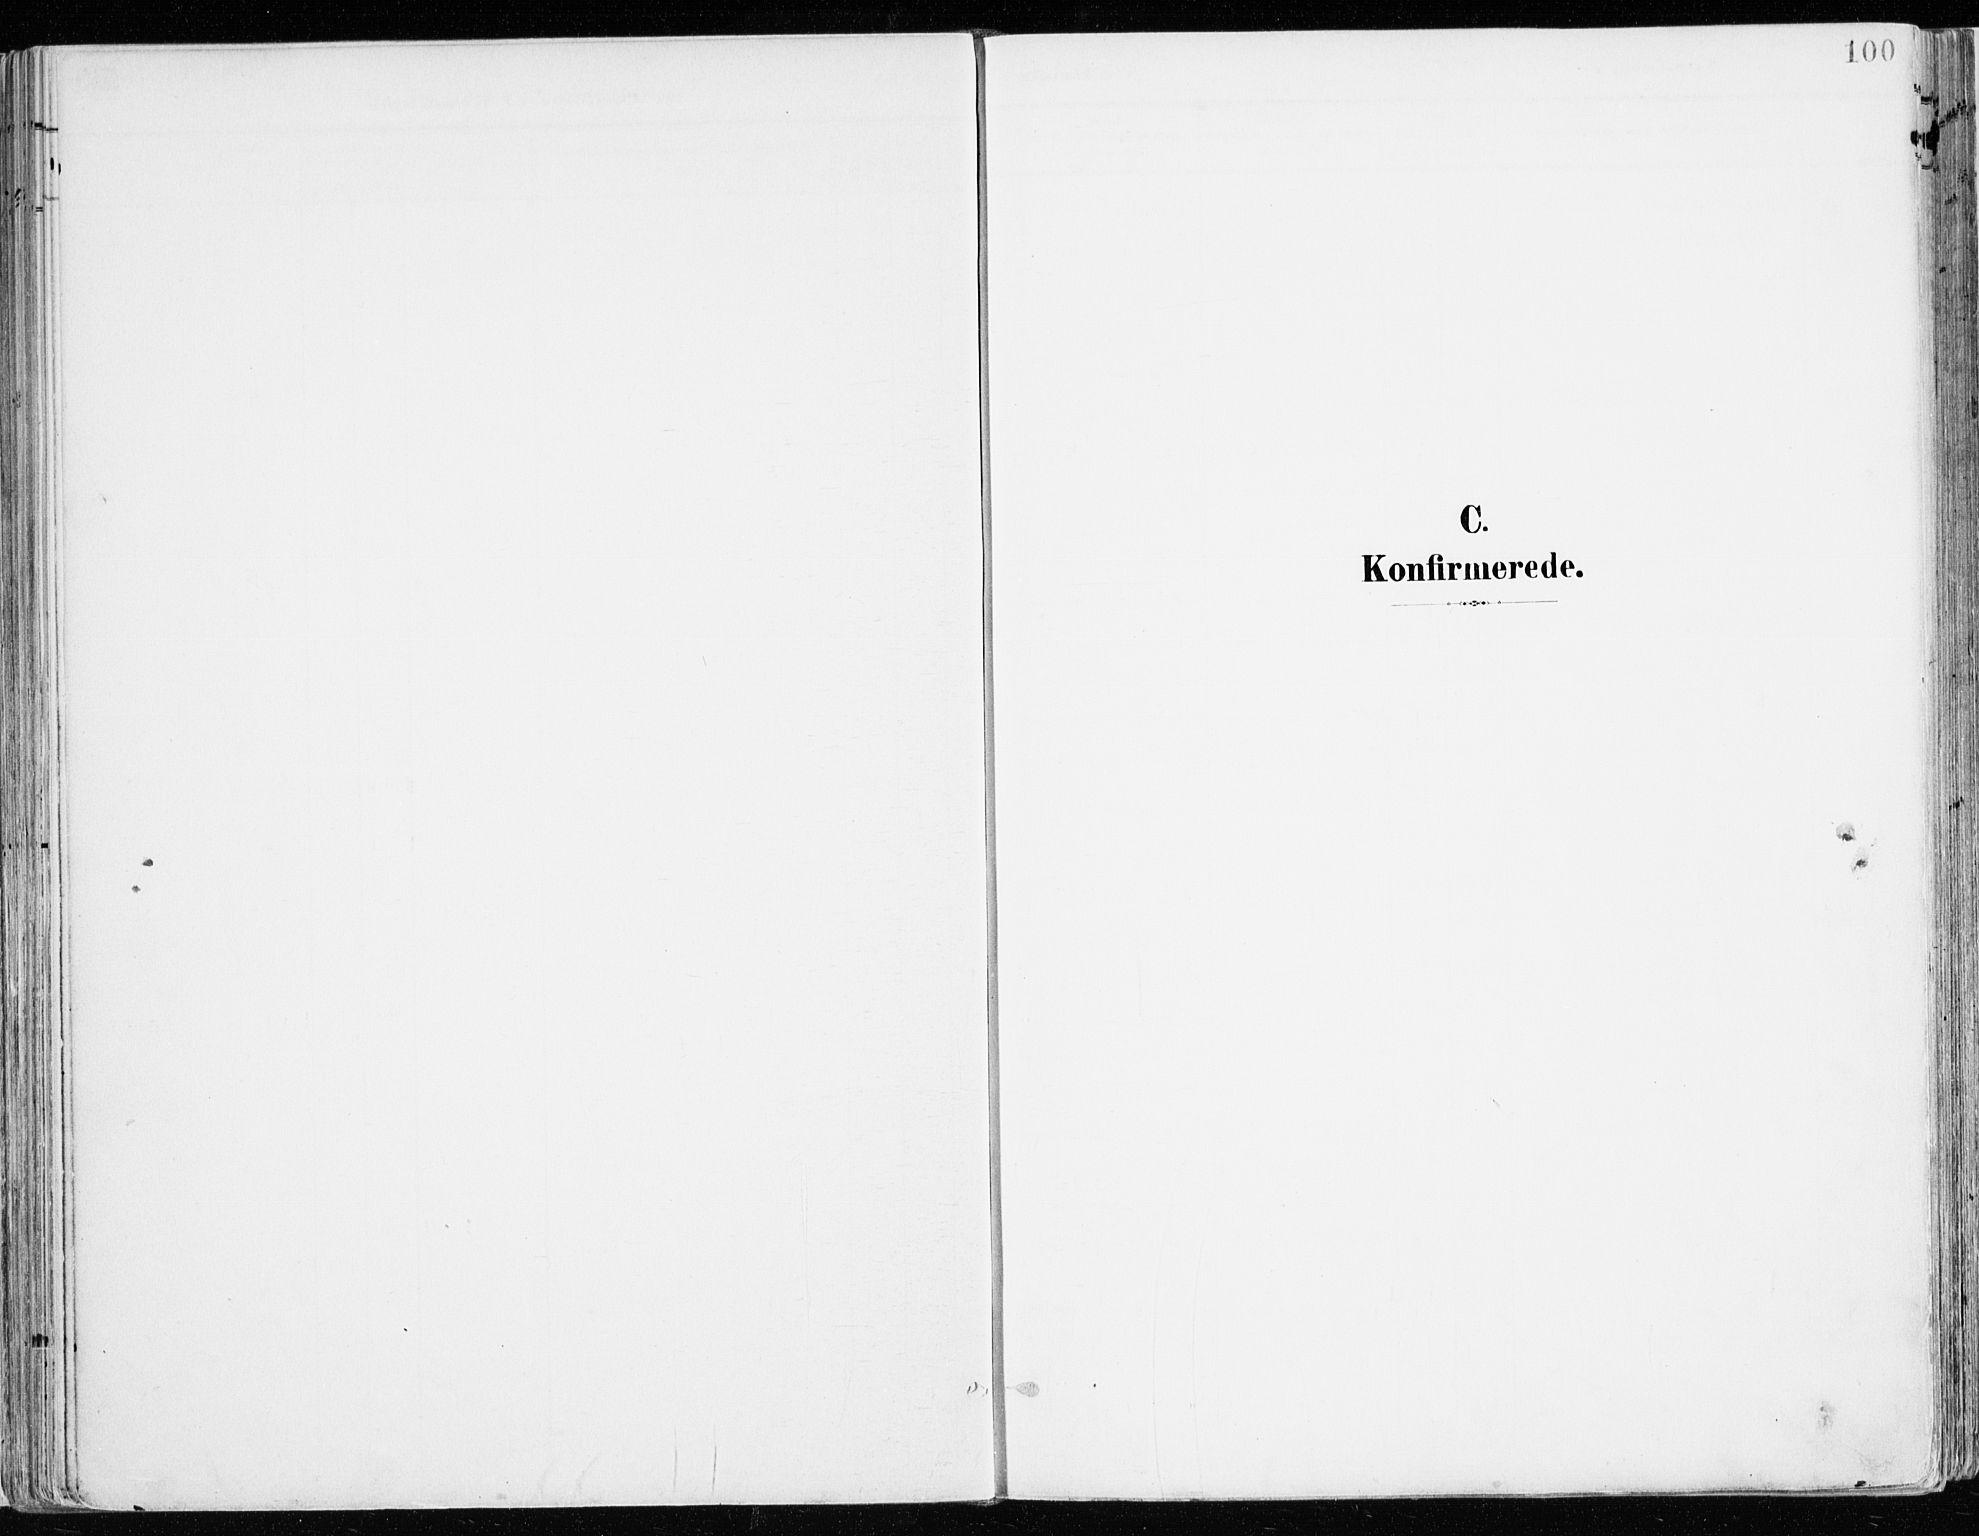 SAH, Nord-Odal prestekontor, Ministerialbok nr. 9, 1902-1926, s. 100